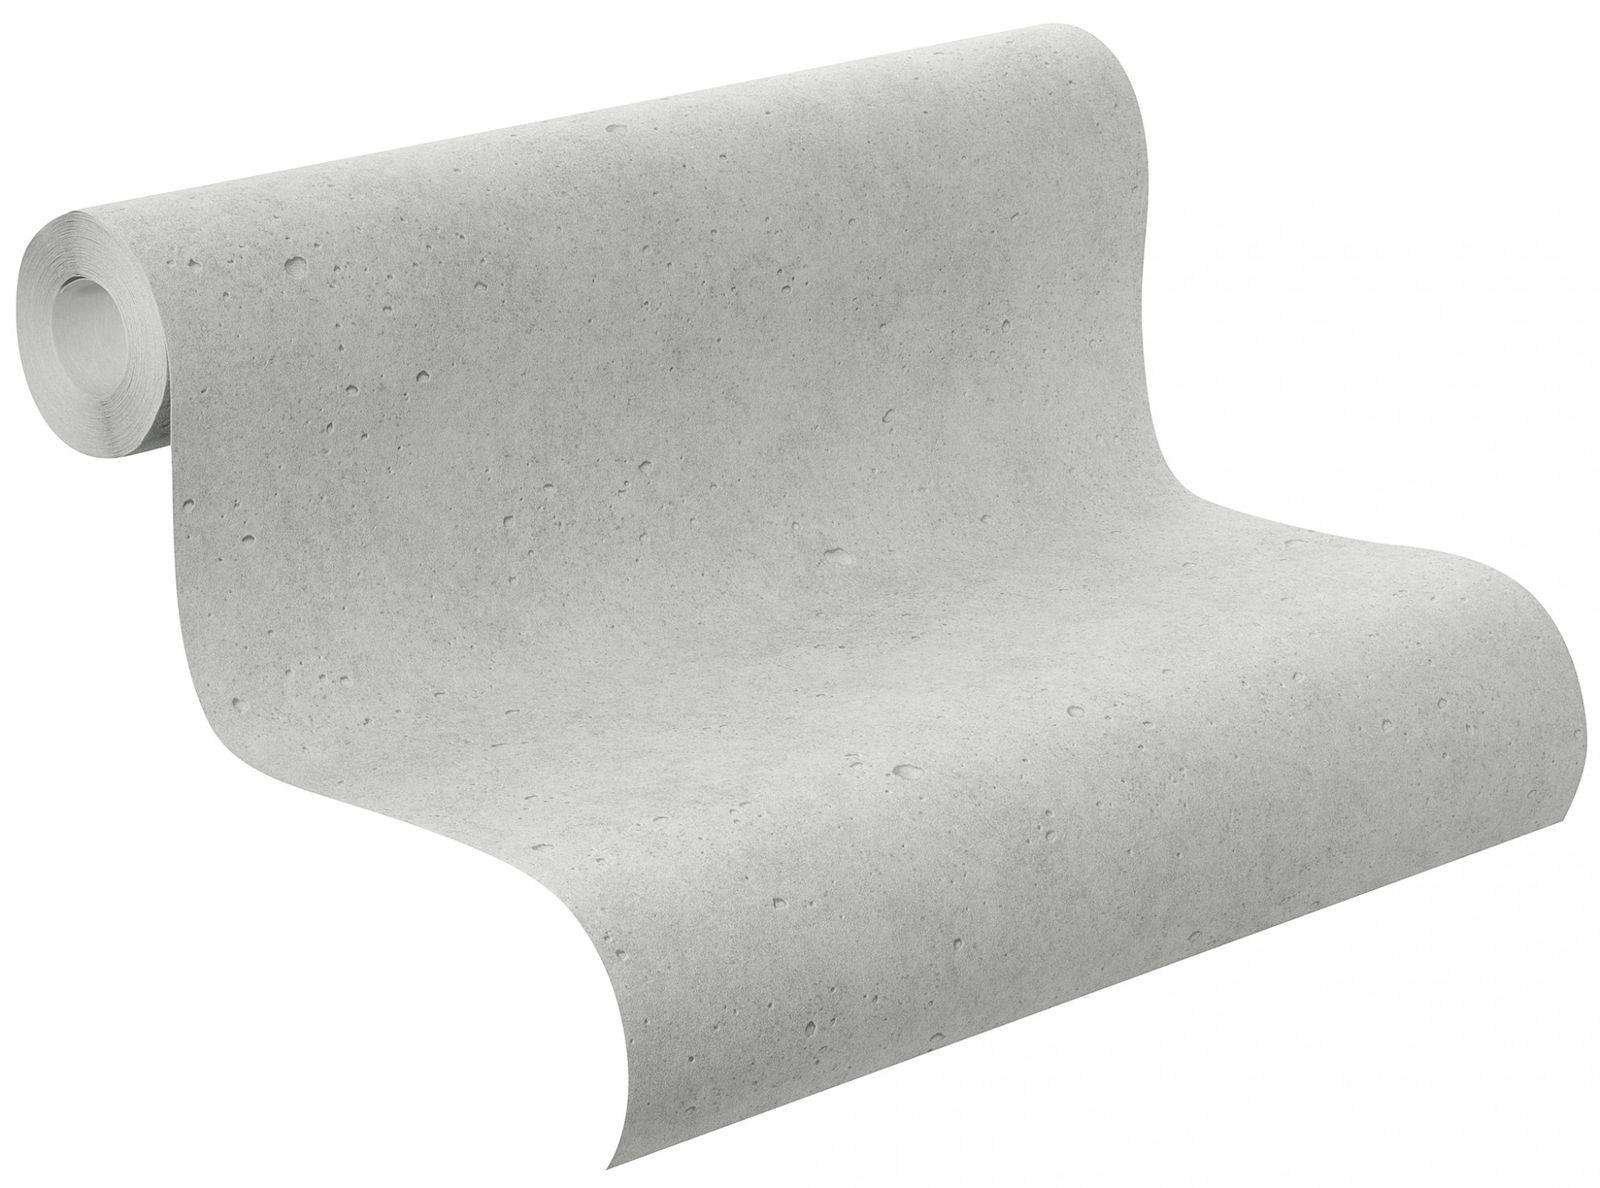 Vliestapete Beton Beton Optik Stein Rasch Grau 475210